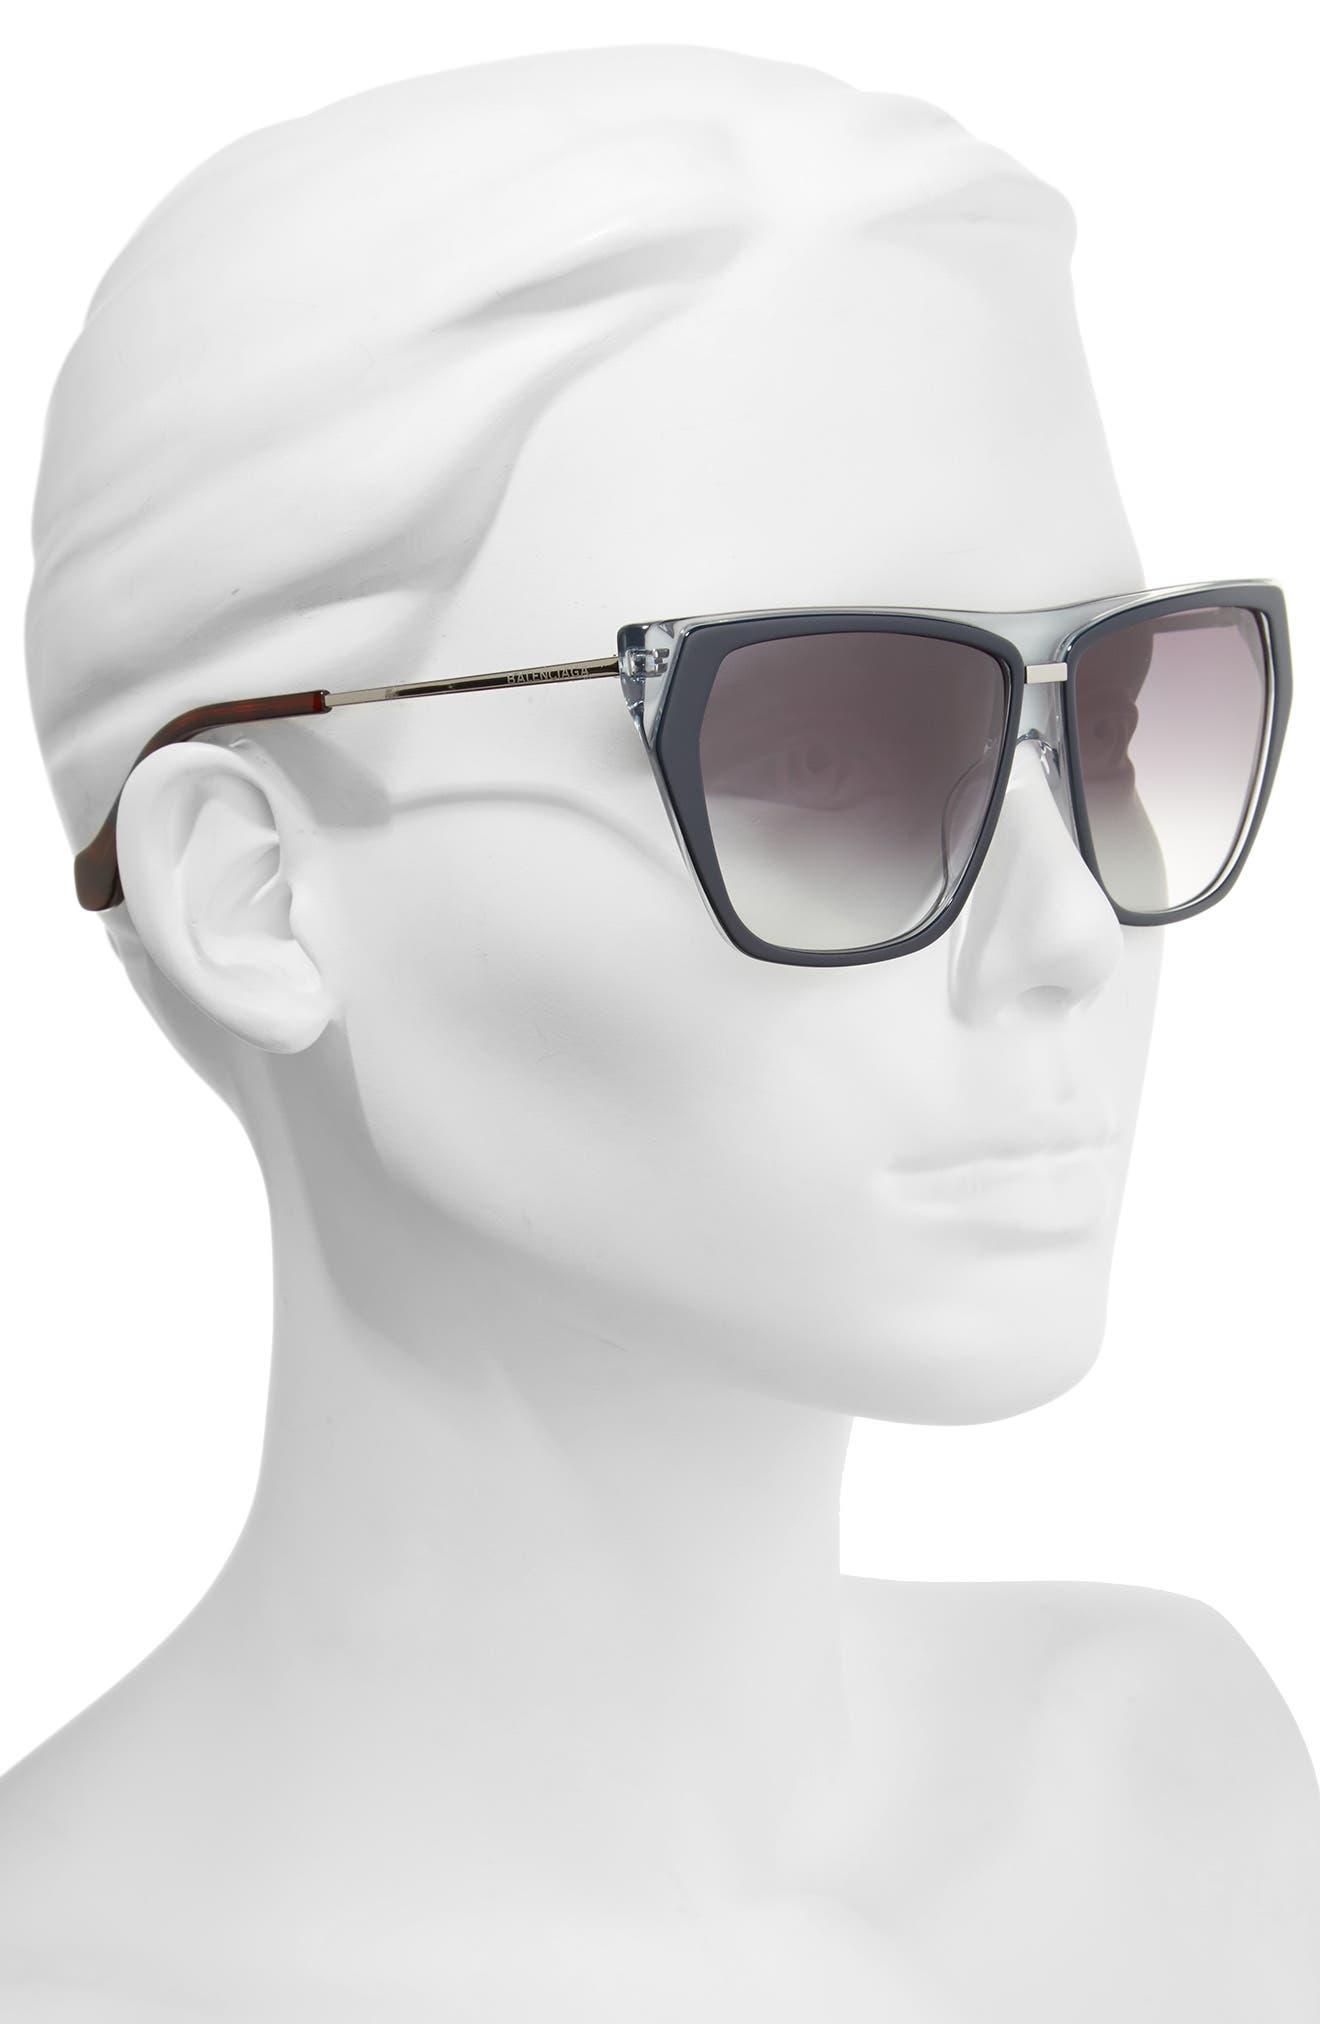 58mm Gradient Sunglasses,                             Alternate thumbnail 2, color,                             Blu Crys/ Havana/ Grdient Smke